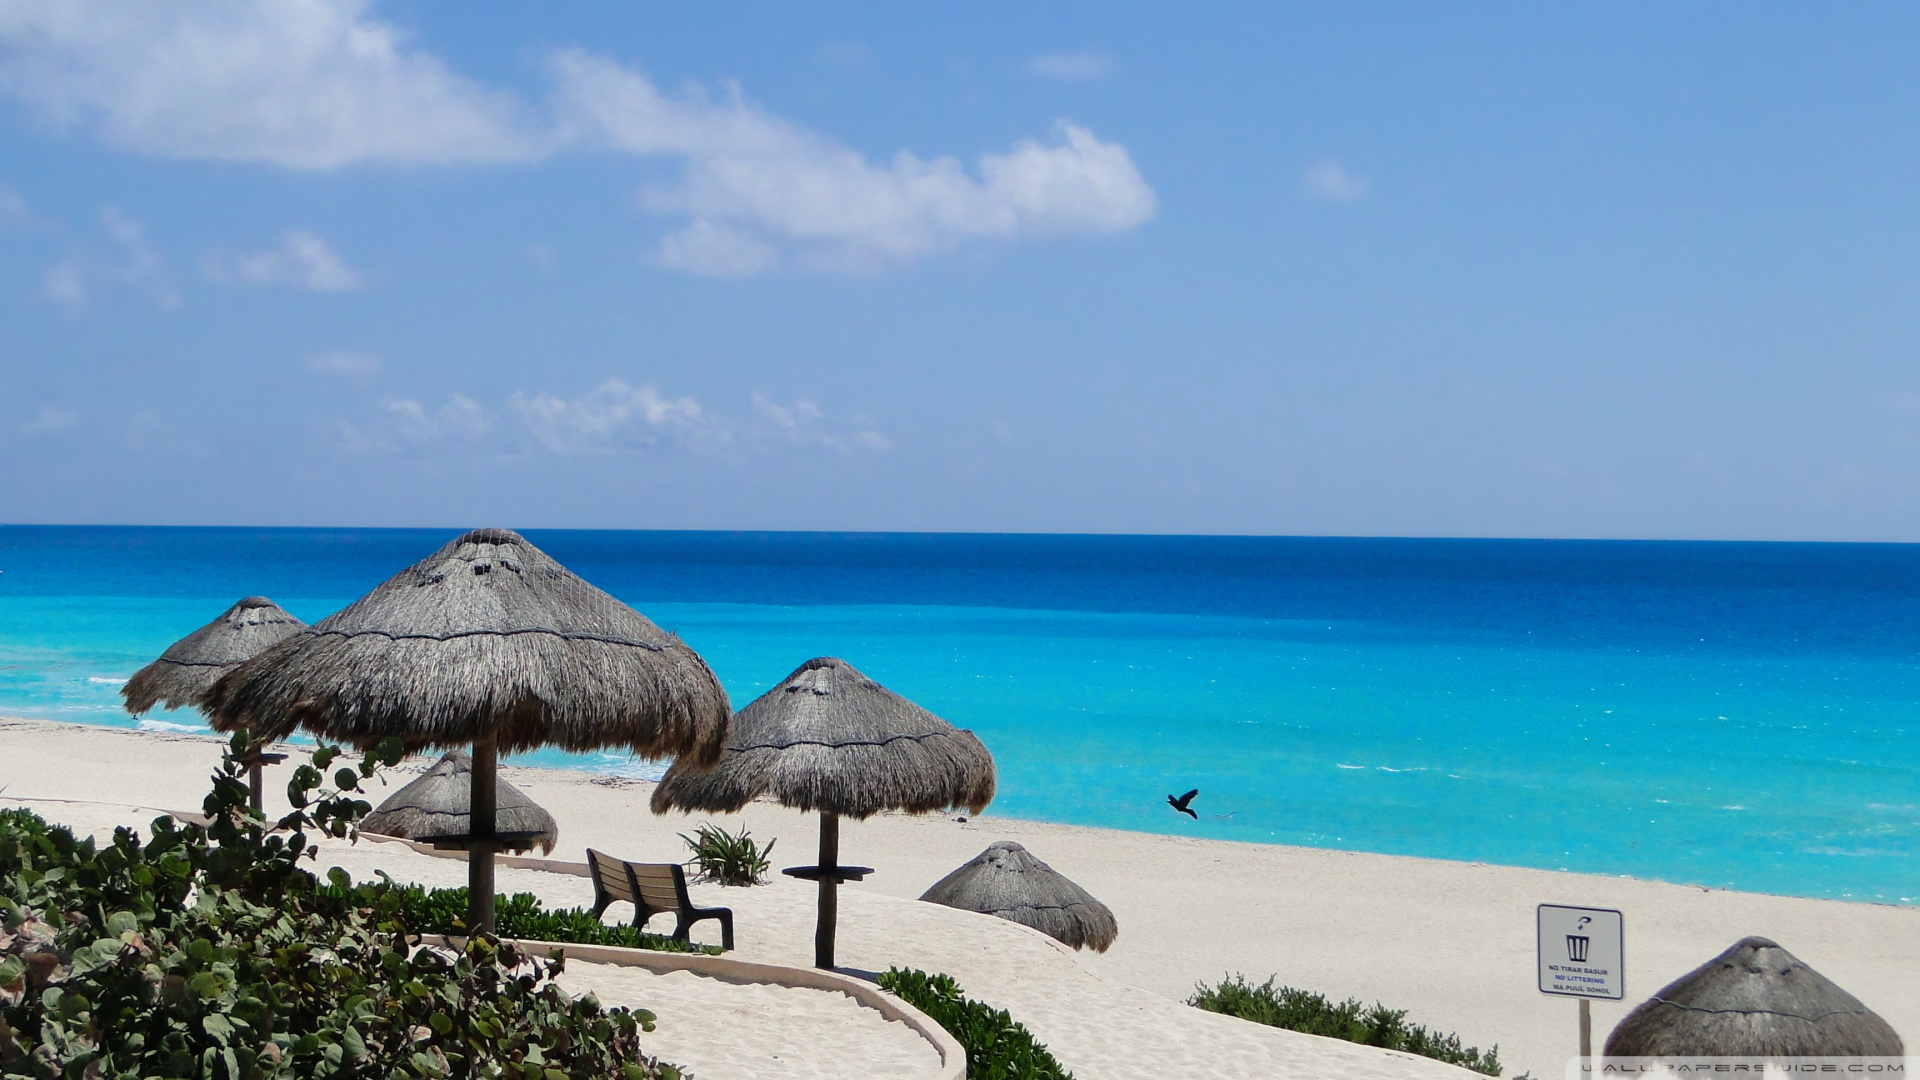 47 Cancun Wallpaper Desktop On Wallpapersafari